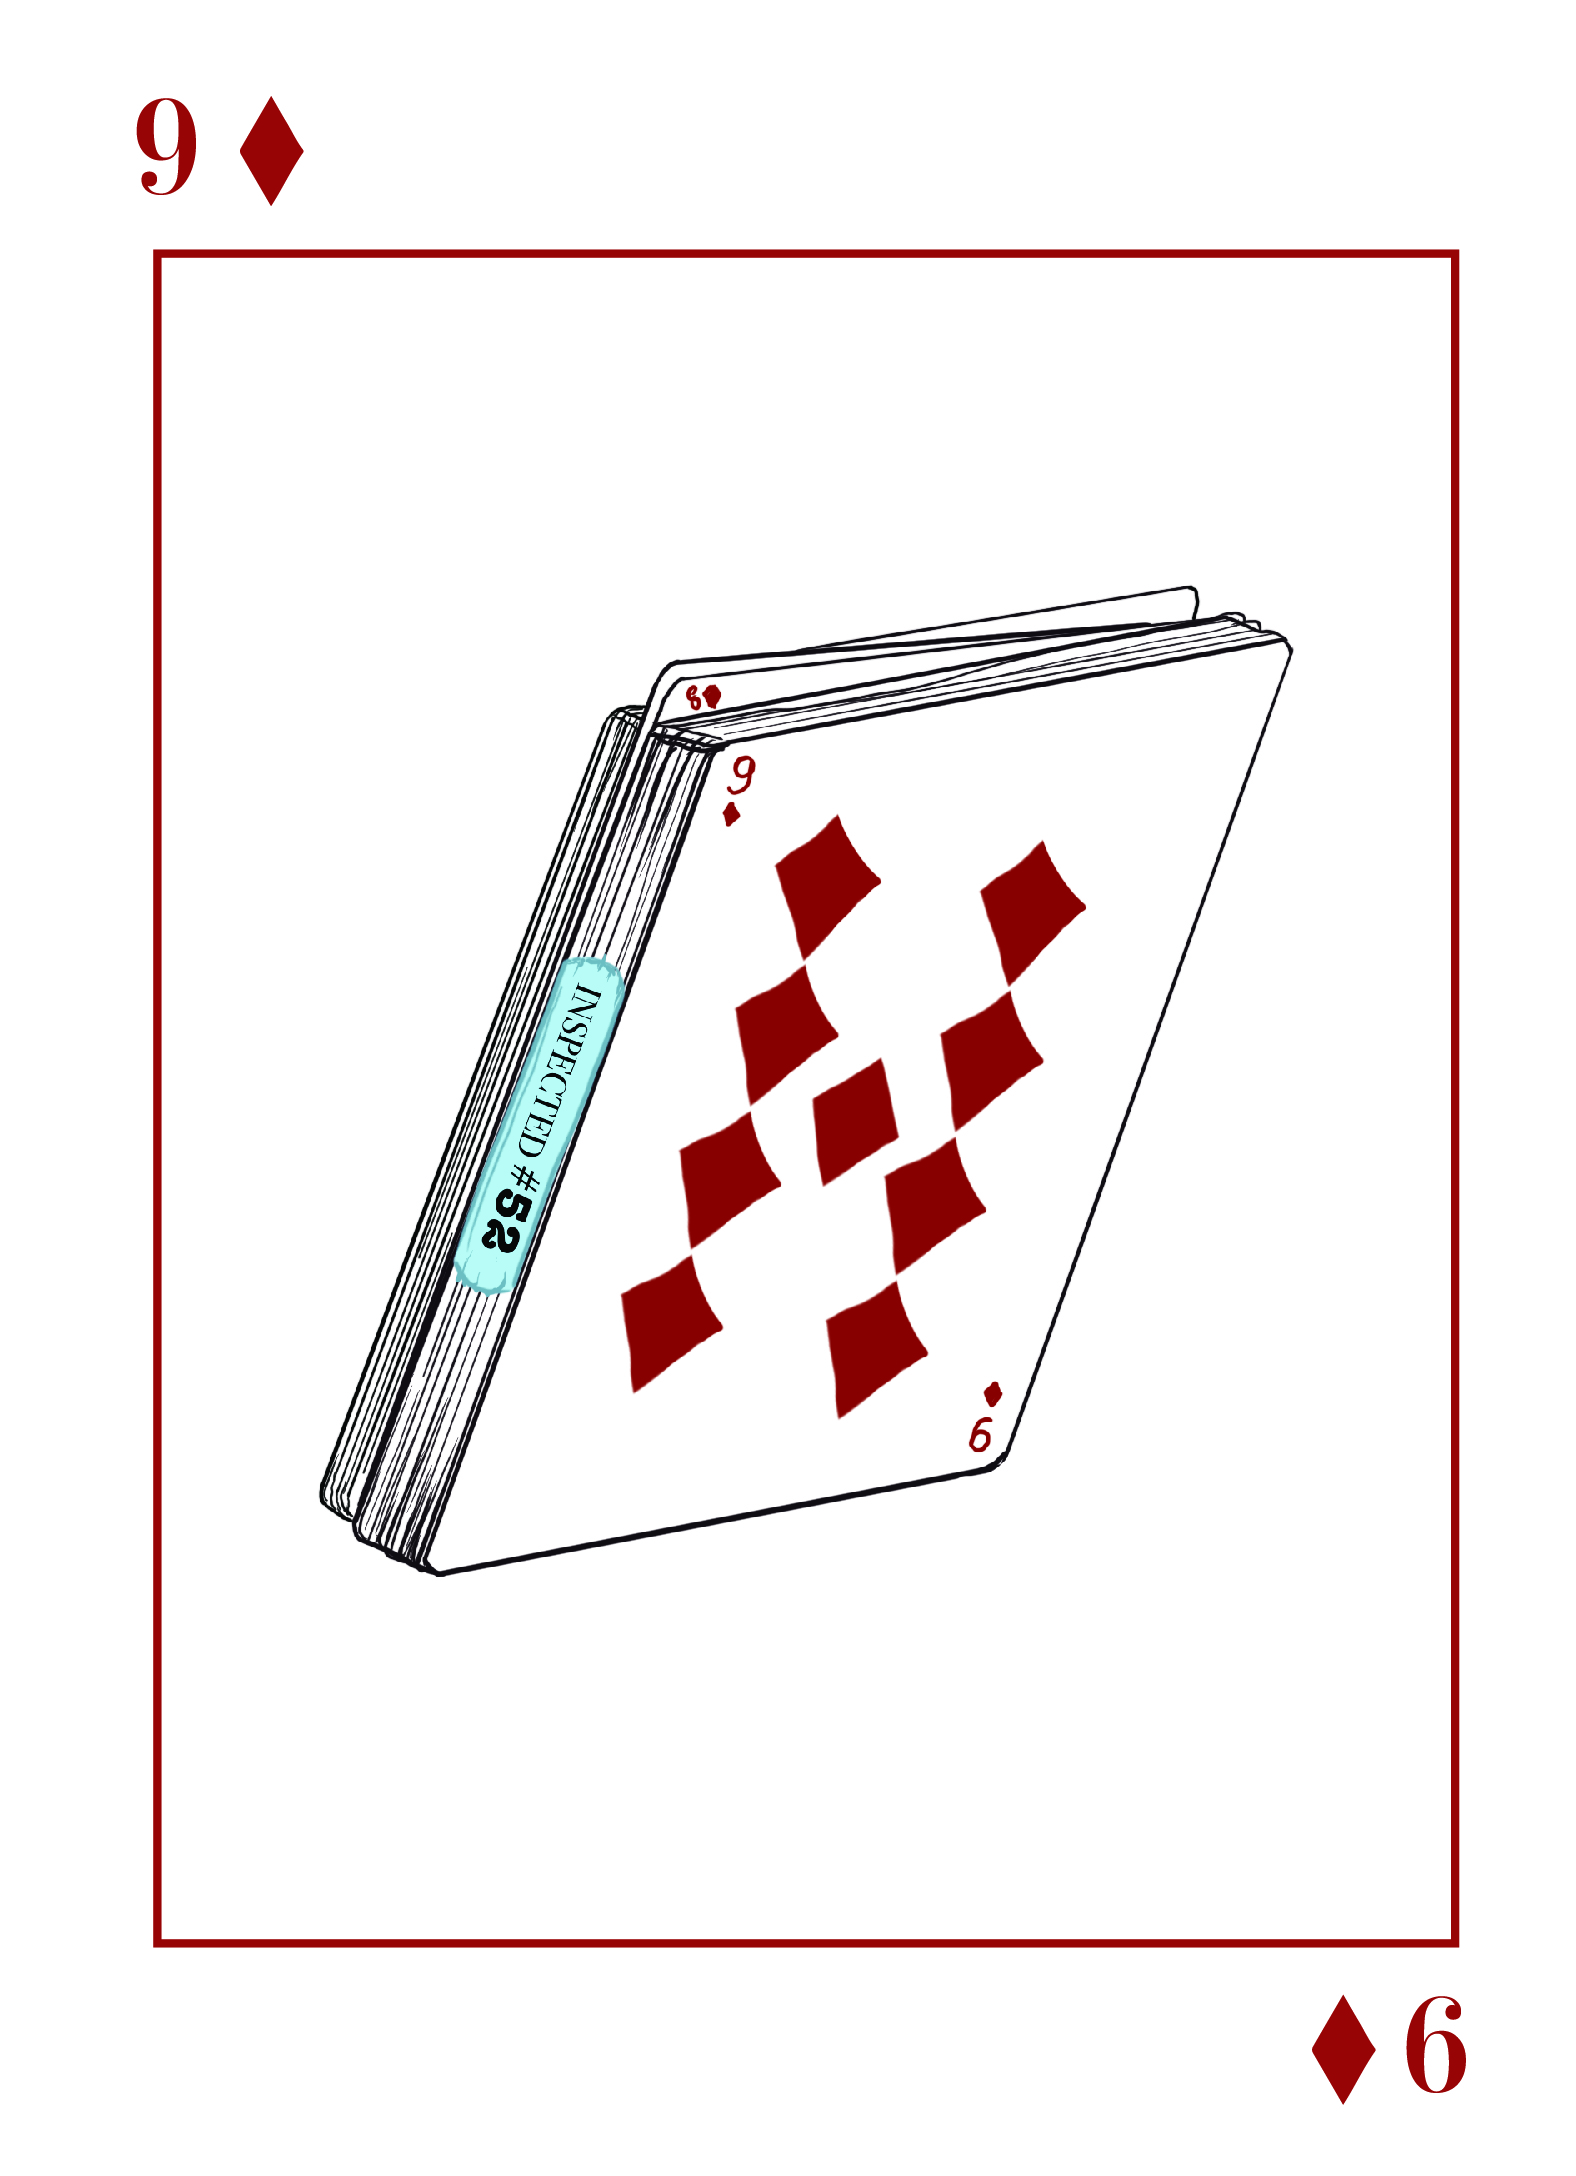 Nine of Diamonds - Mnemonica and Aronson